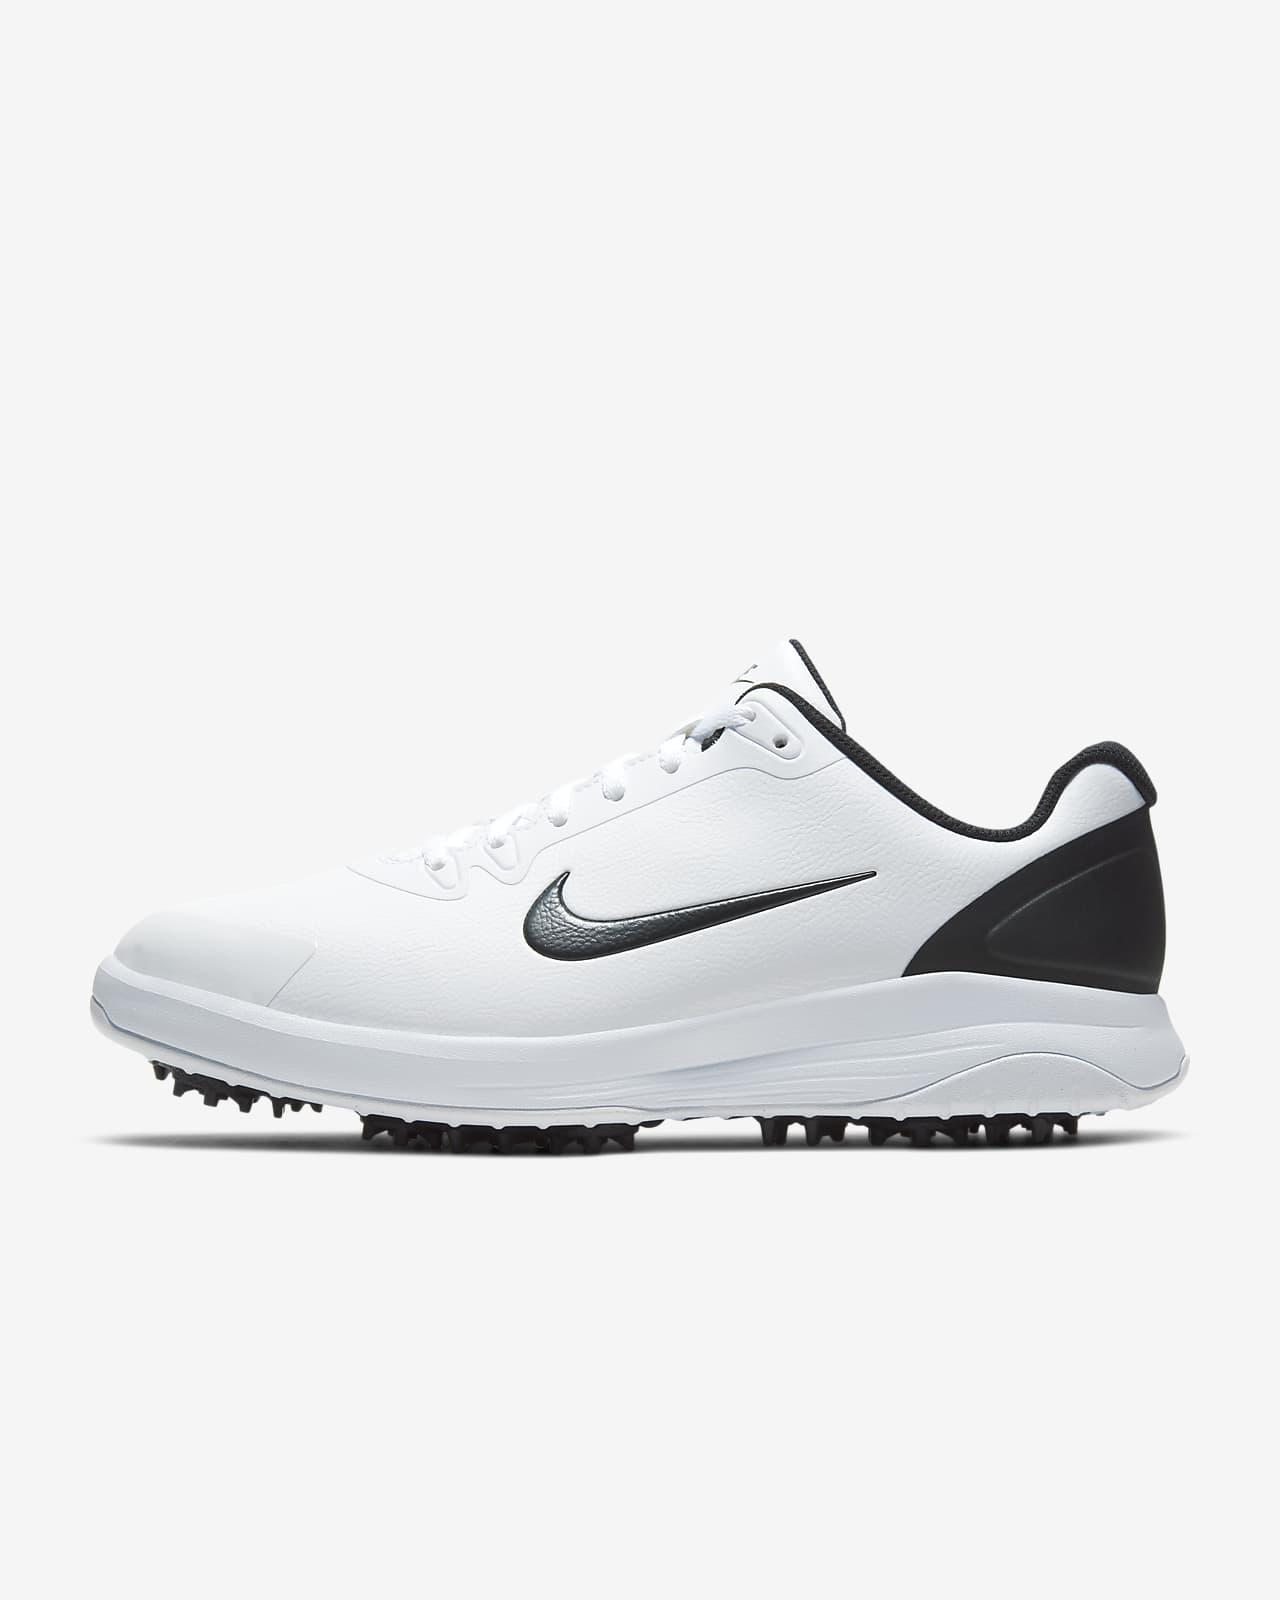 Nike Infinity G Golf Shoe (Wide)